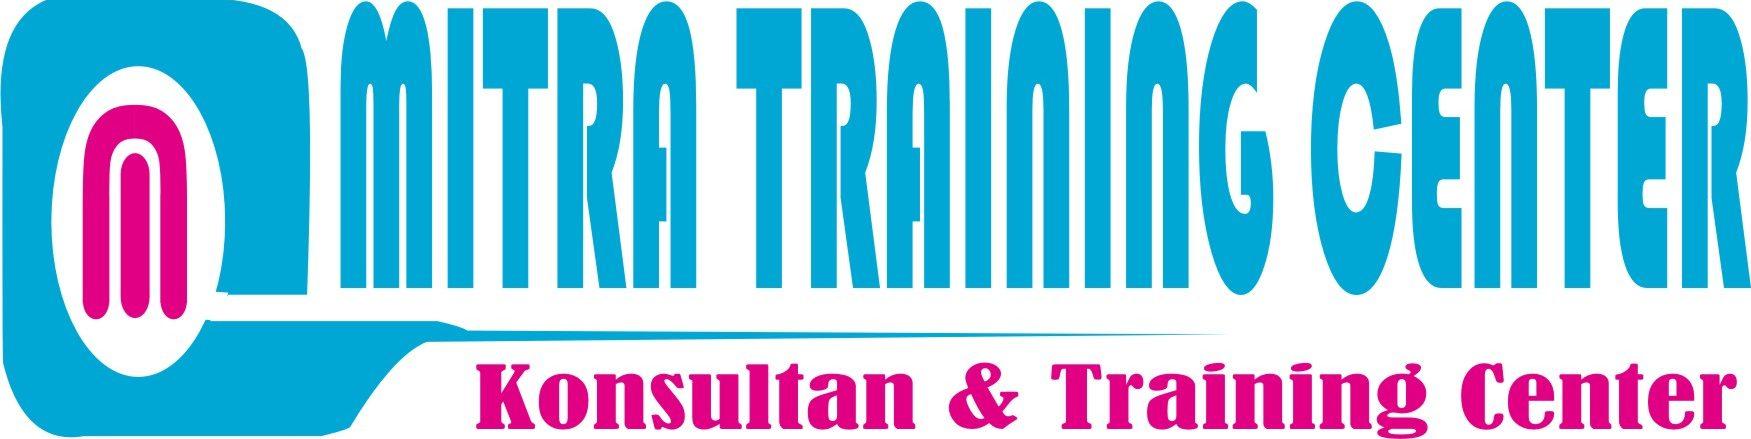 Pelatihan PONEK – Pelatihan PONED – Pelatihan APN – Pelatihan Geriatri – Pelatihan SPI Rumah Sakit – Pelatihan CSSD Rumah Sakit  – Pelatihan Rekam Medis